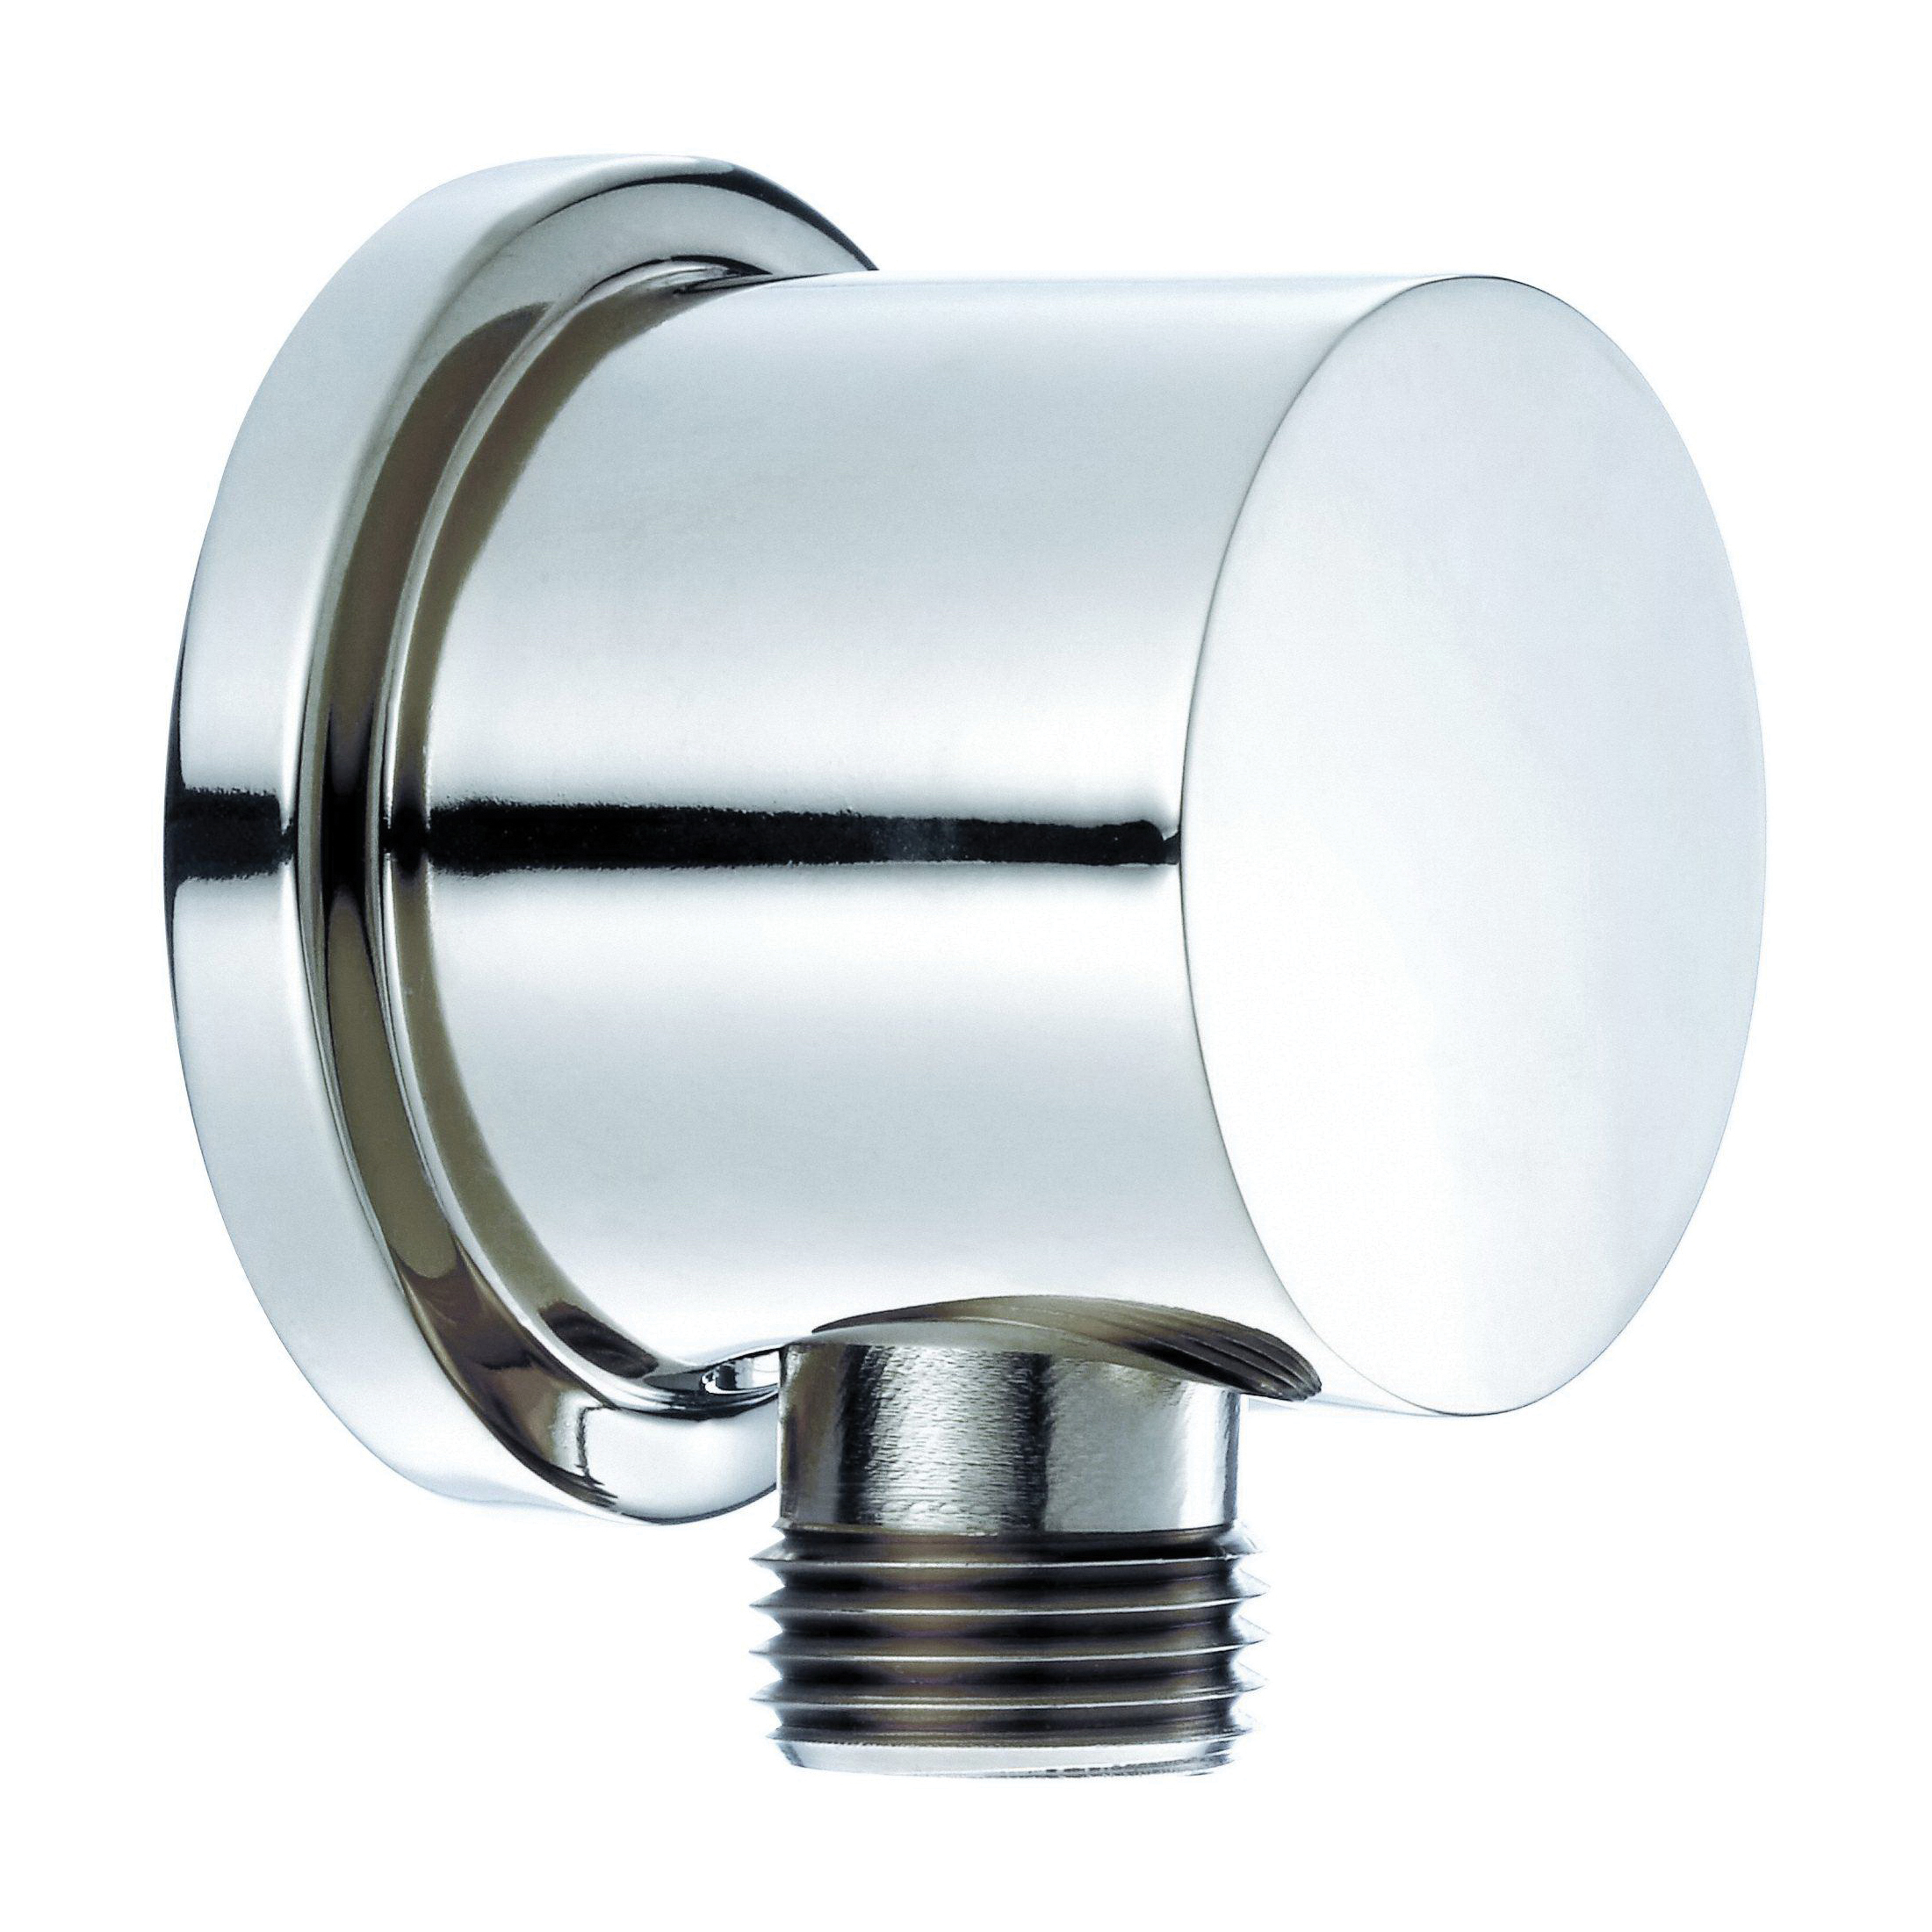 Danze® D469058 Round Wall Mount Supply Elbow, 1/2-14, NPSM, Brass